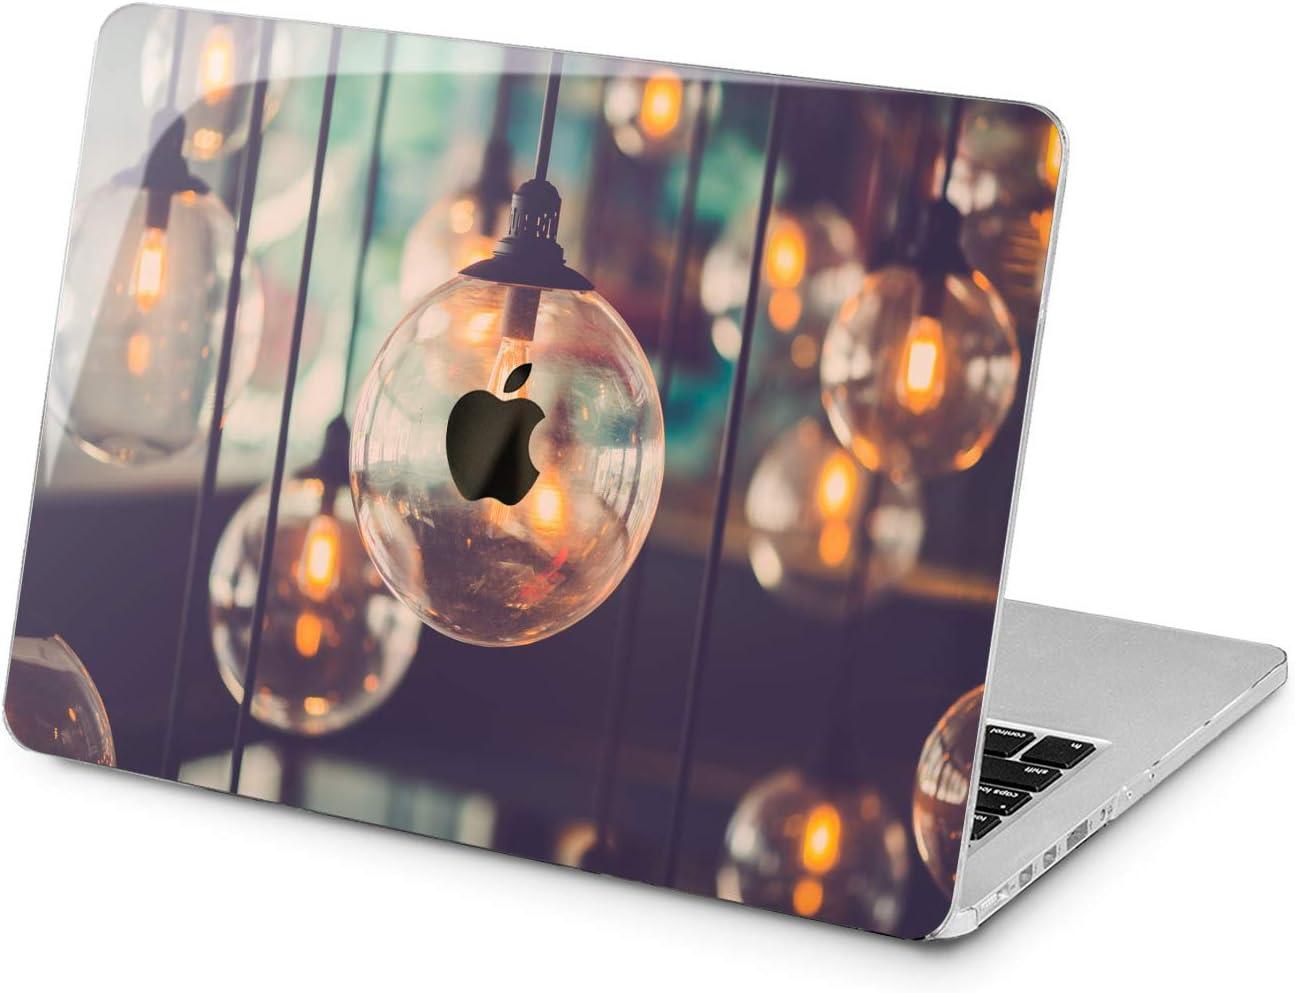 "Cavka Hard Shell Case for Apple MacBook Pro 13"" 2019 15"" 2018 Air 13"" 2020 Retina 2015 Mac 11"" Mac 12"" Protective Pattern Light Design Print New Cover Unique Laptop Vintage Plastic Bulbs Lamp Gentle"